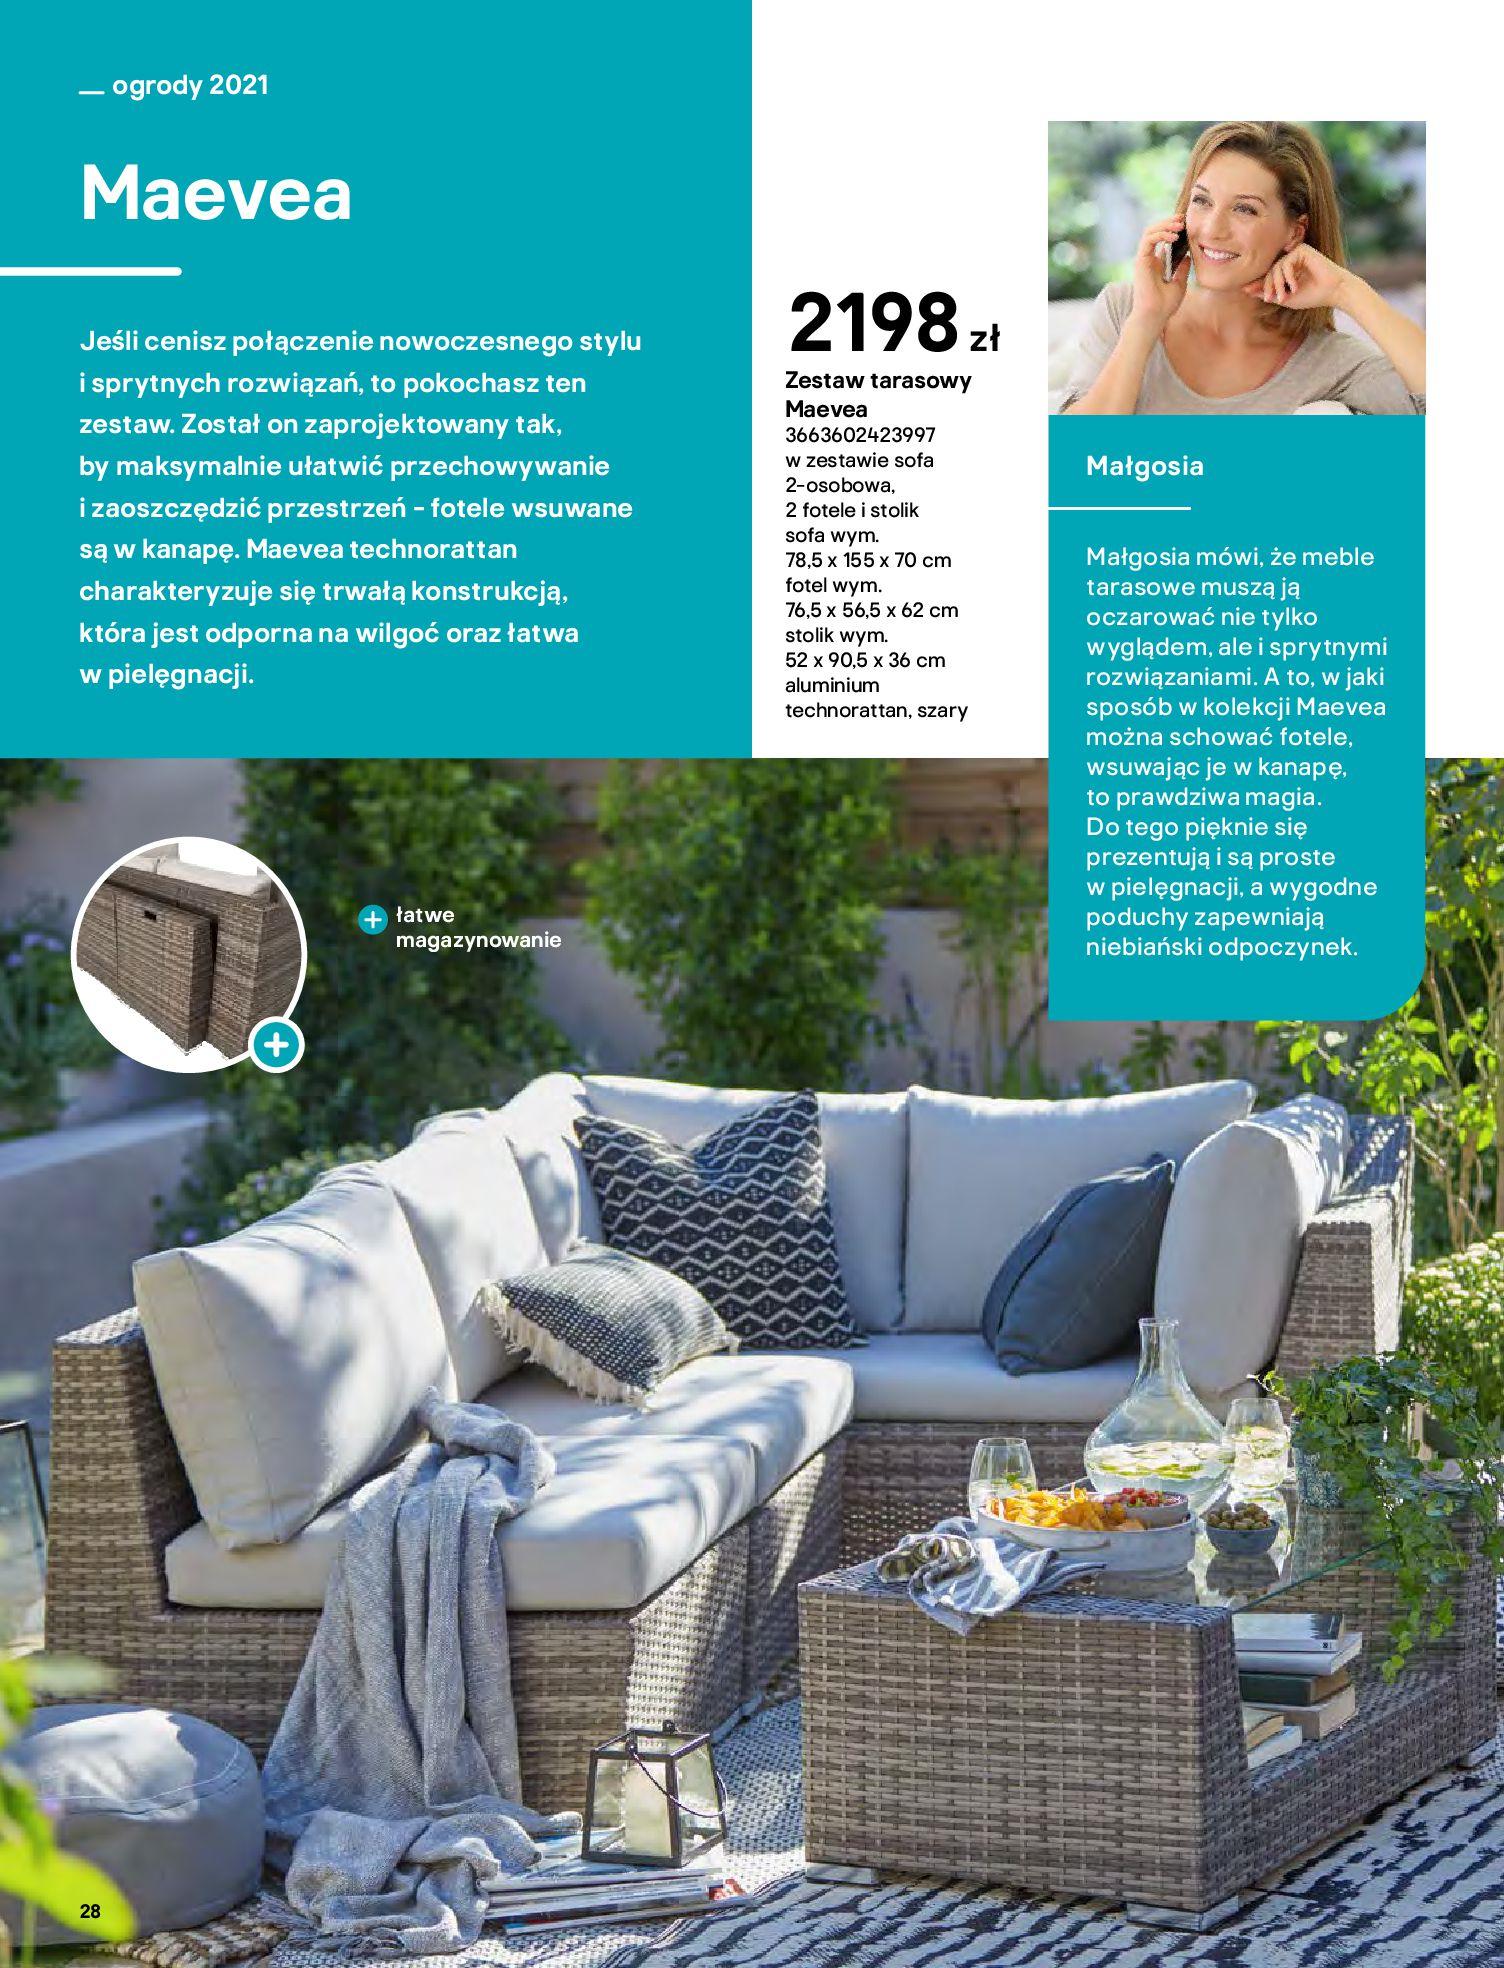 Gazetka Castorama: Katalog ogrody 2021-03-01 page-28